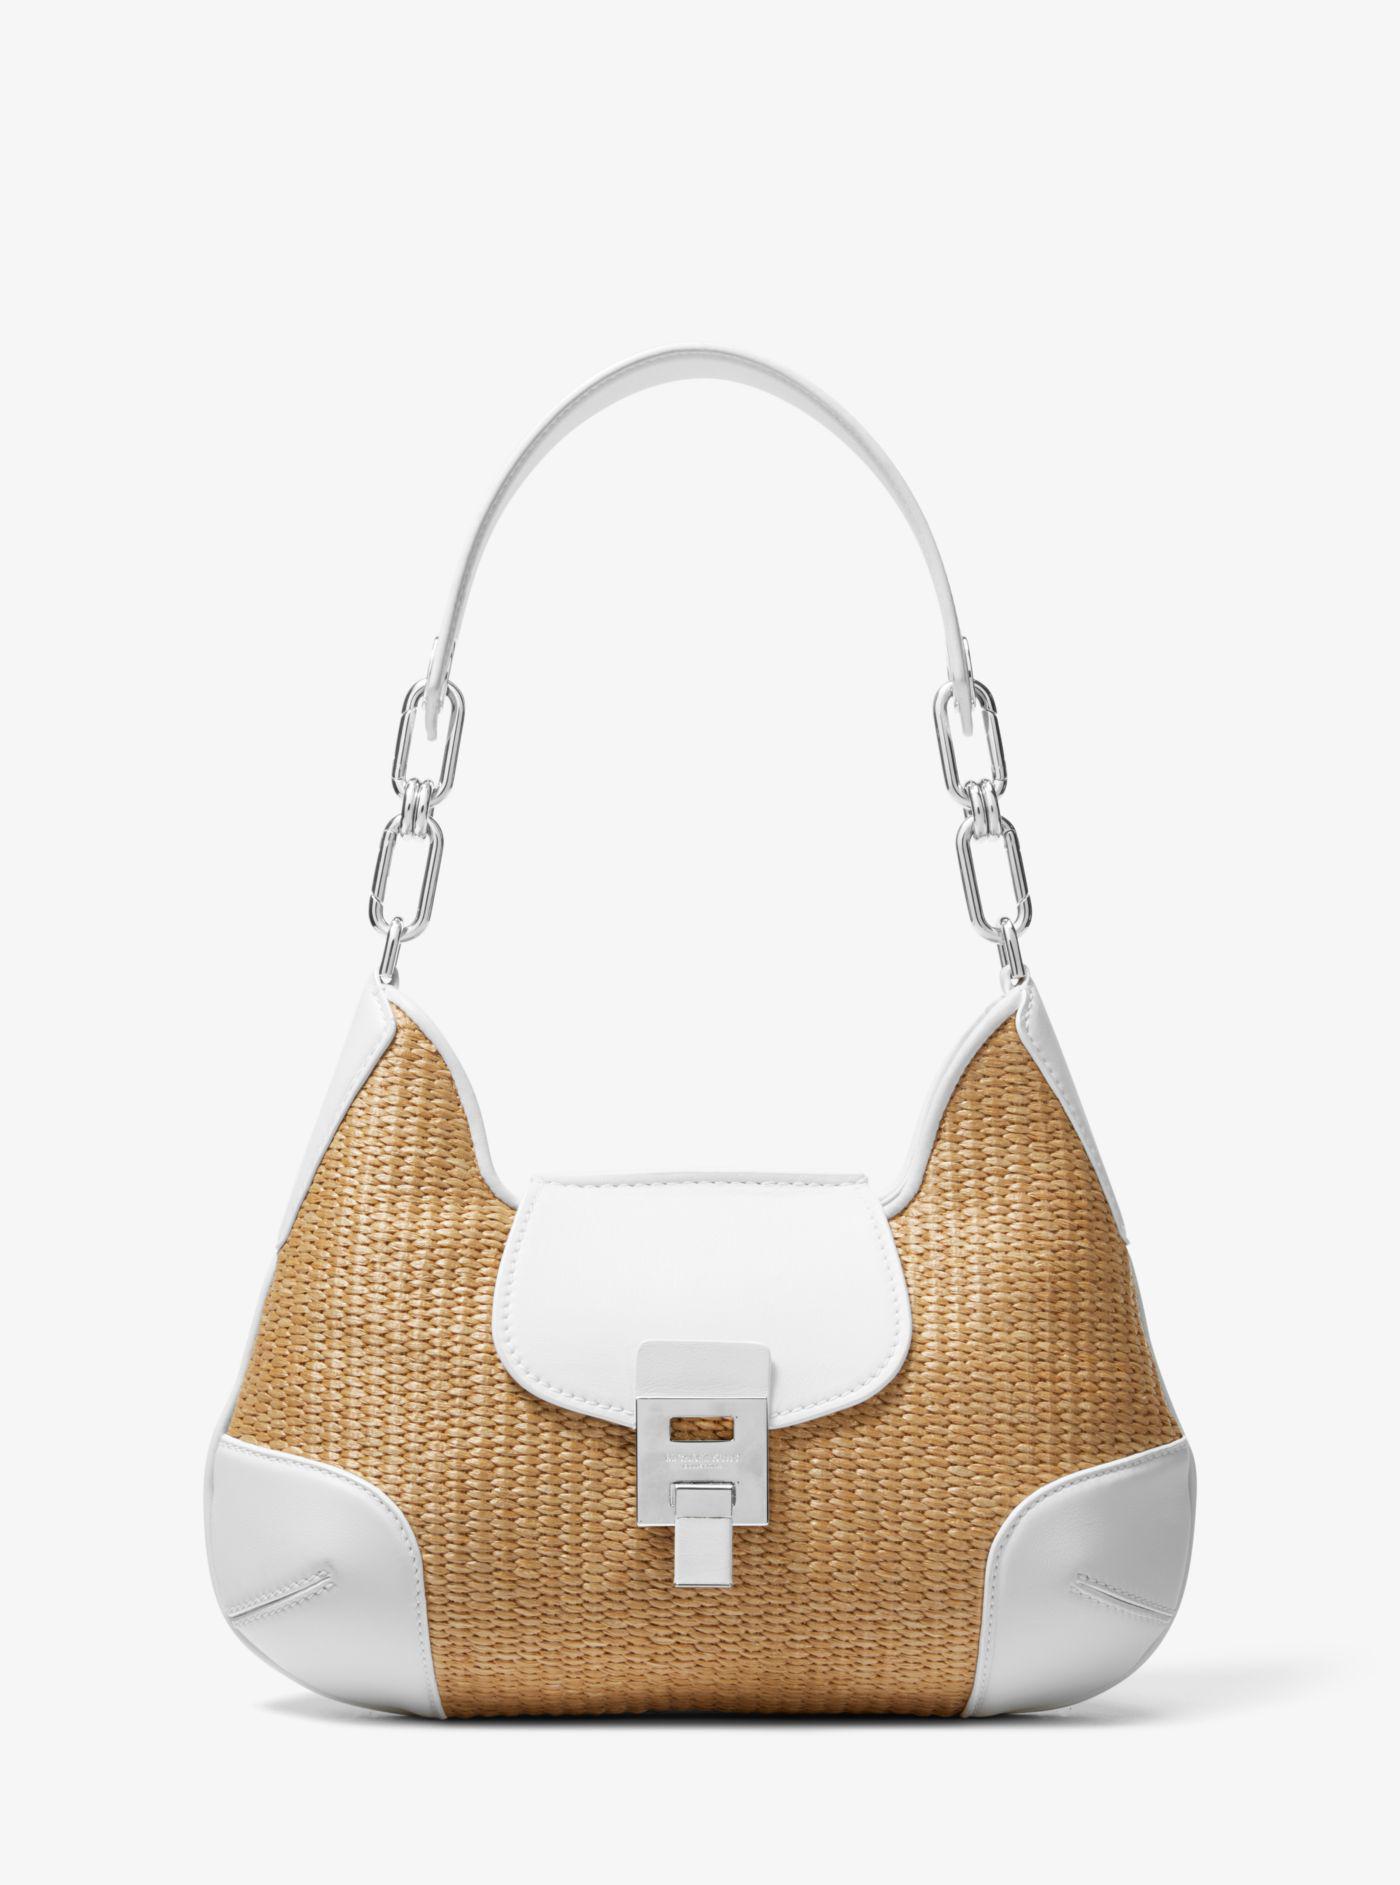 04a63a318a3b7 Lyst - Michael Kors Bancroft Medium Raffia Shoulder Bag in White